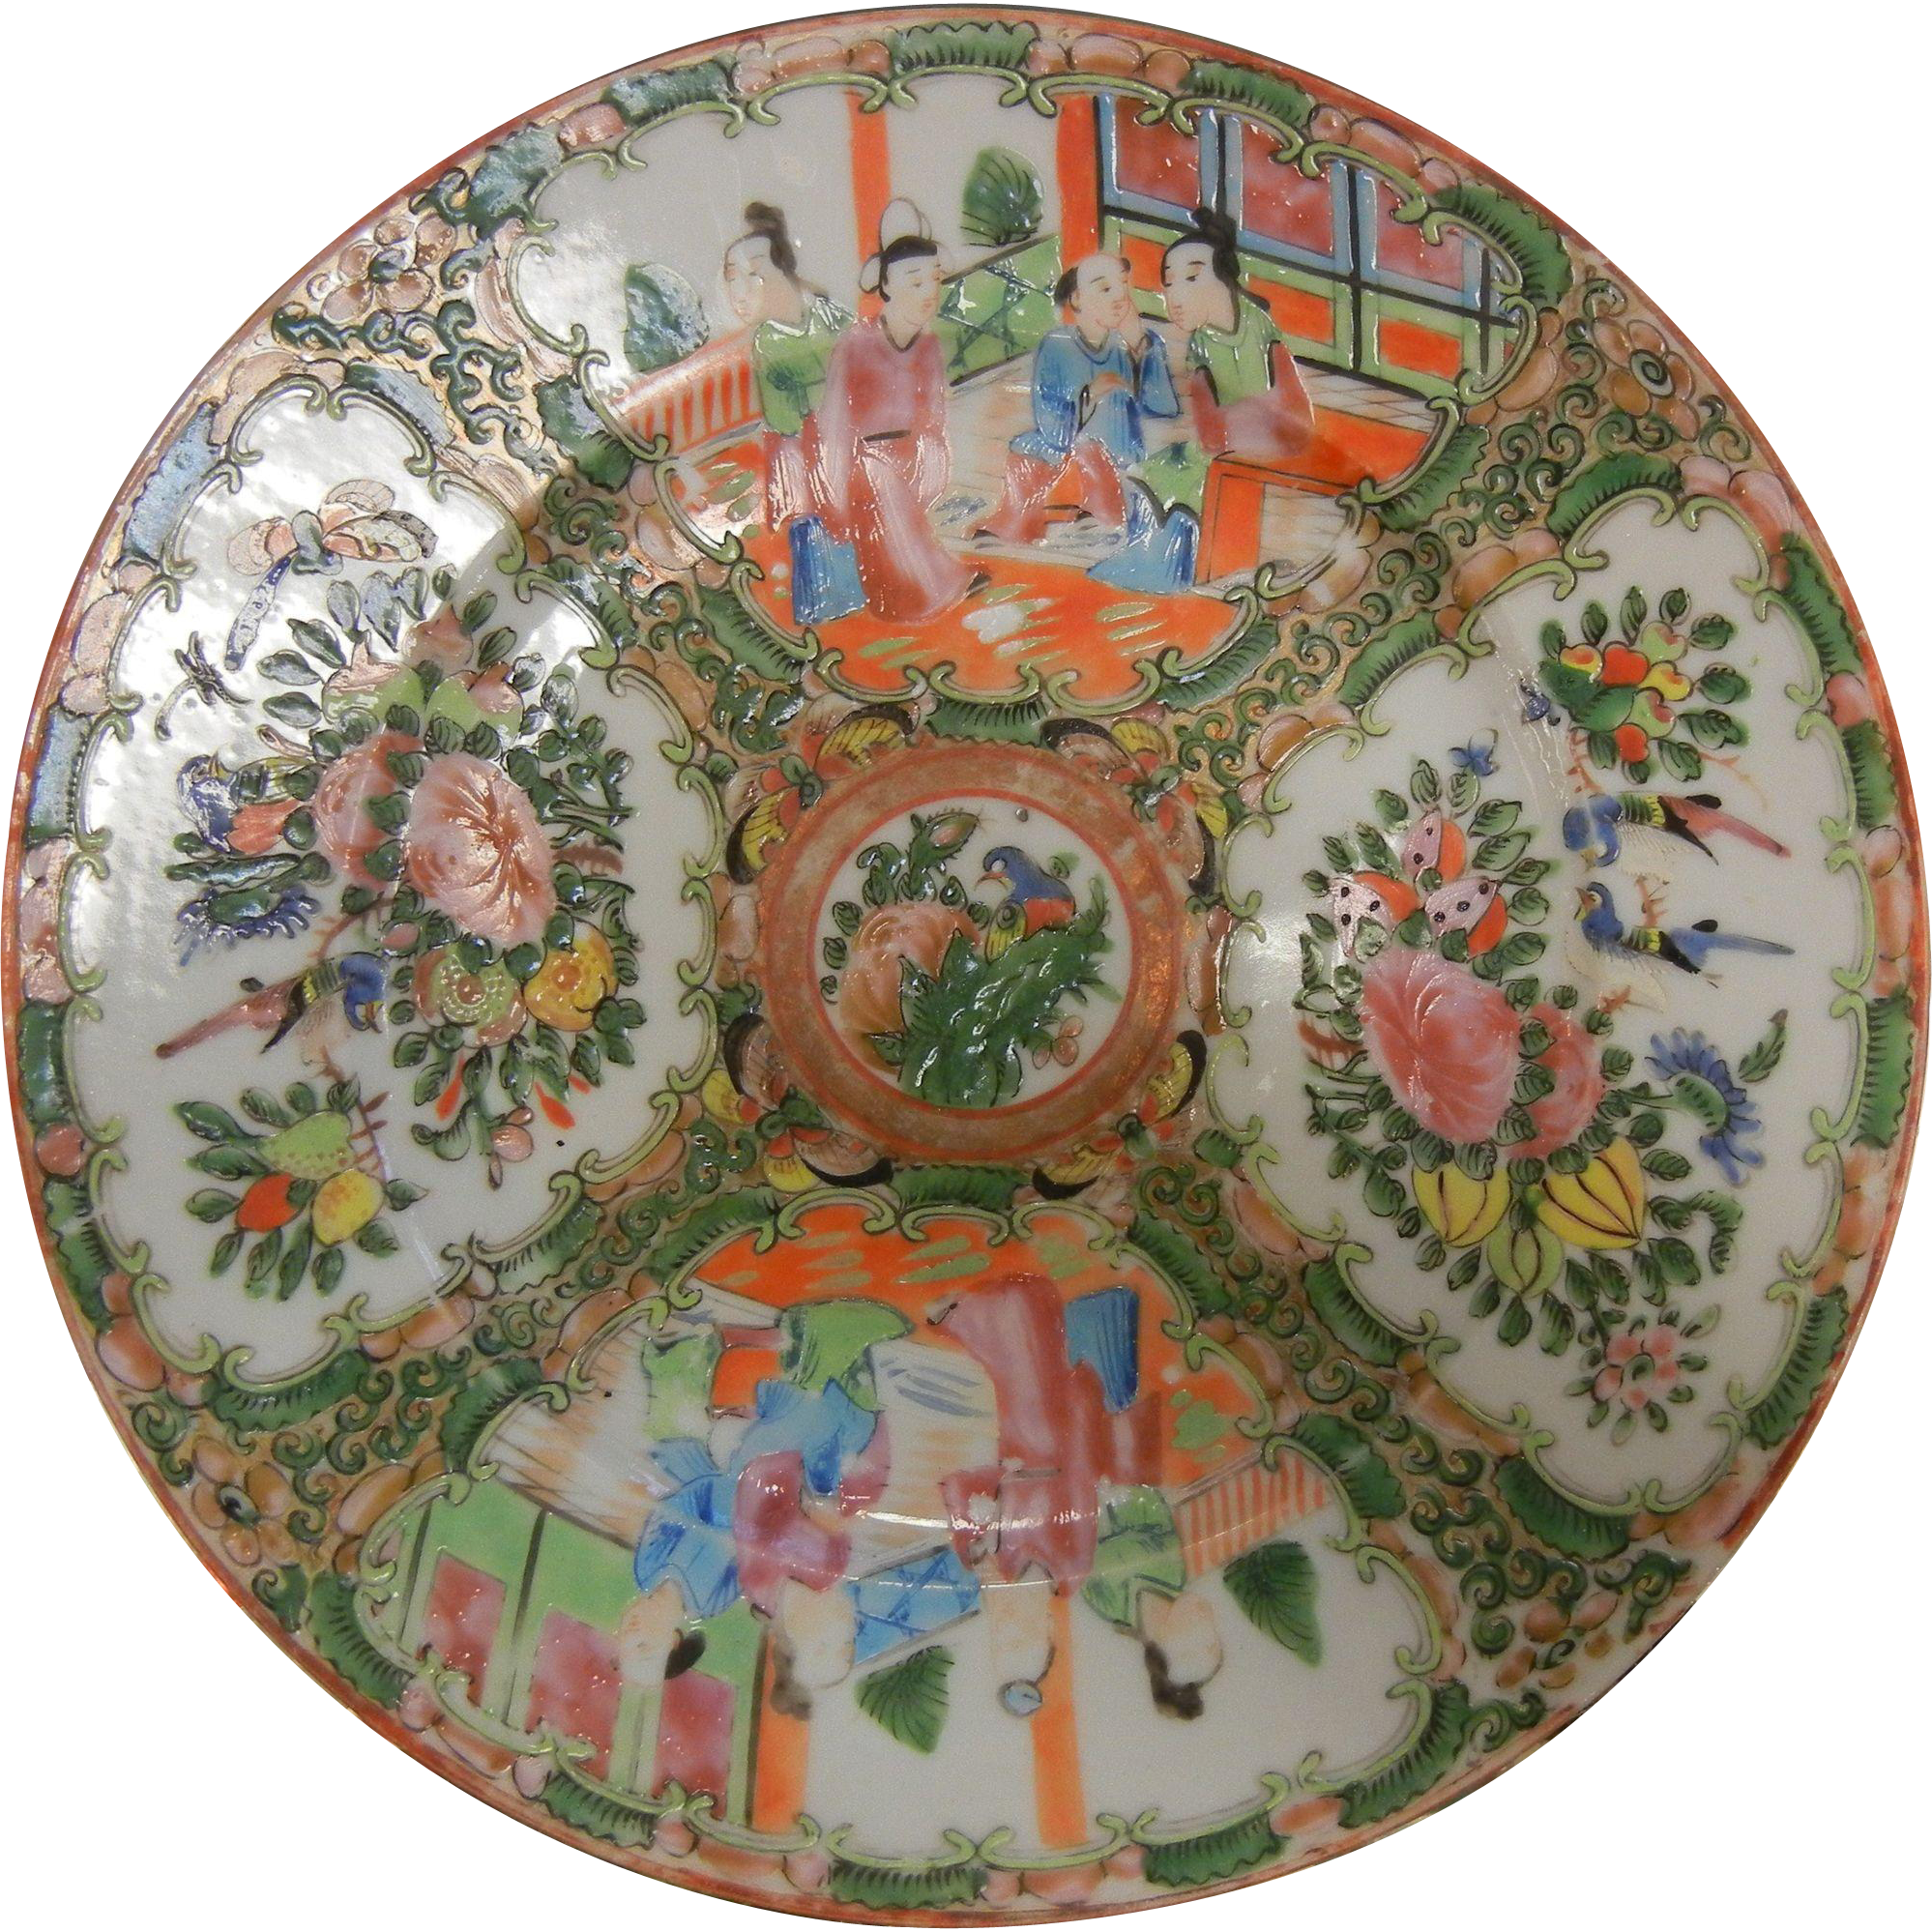 Vintage Chinese Rose Medallion Enameled Porcelain Plate